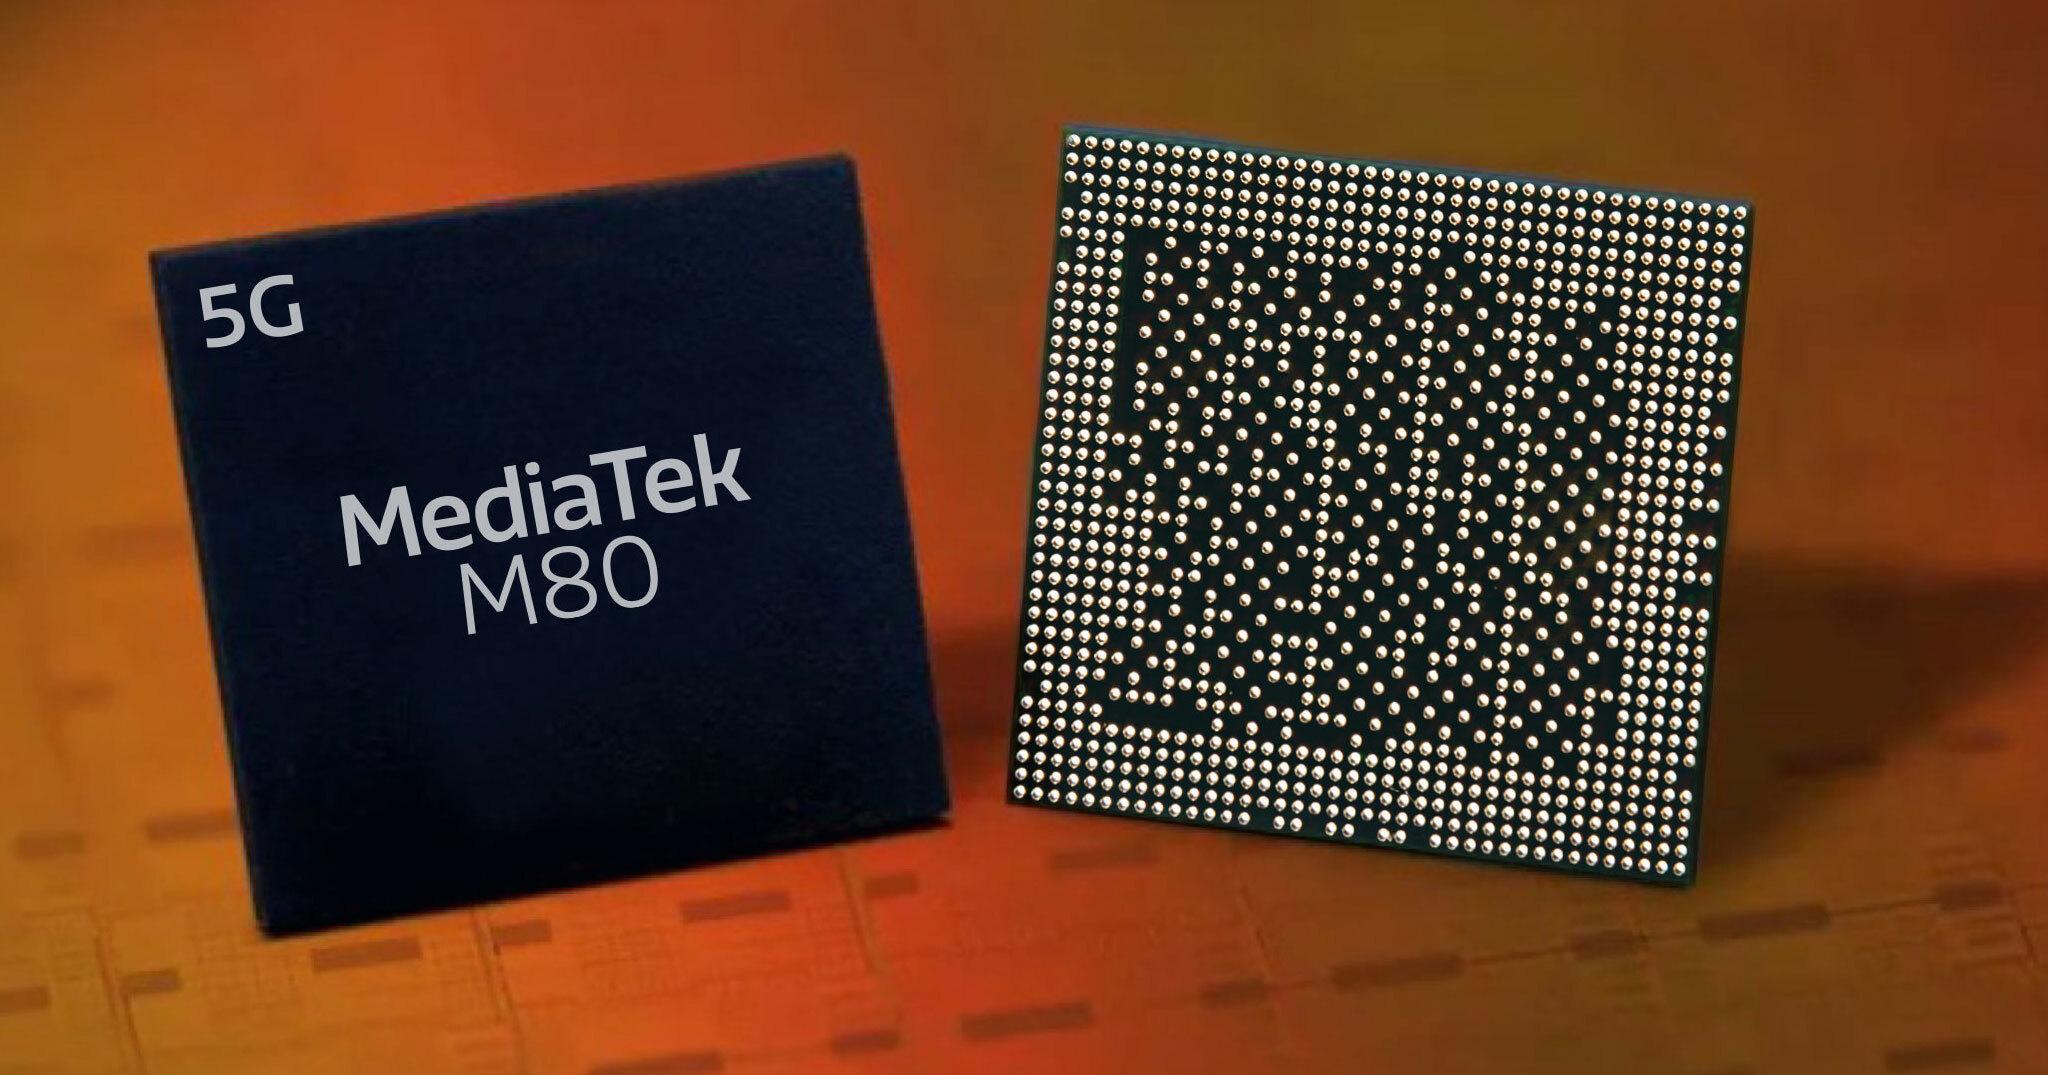 MediaTek & Keysight achieve 6Gbps throughput via 5G Sub-6 3CC CA